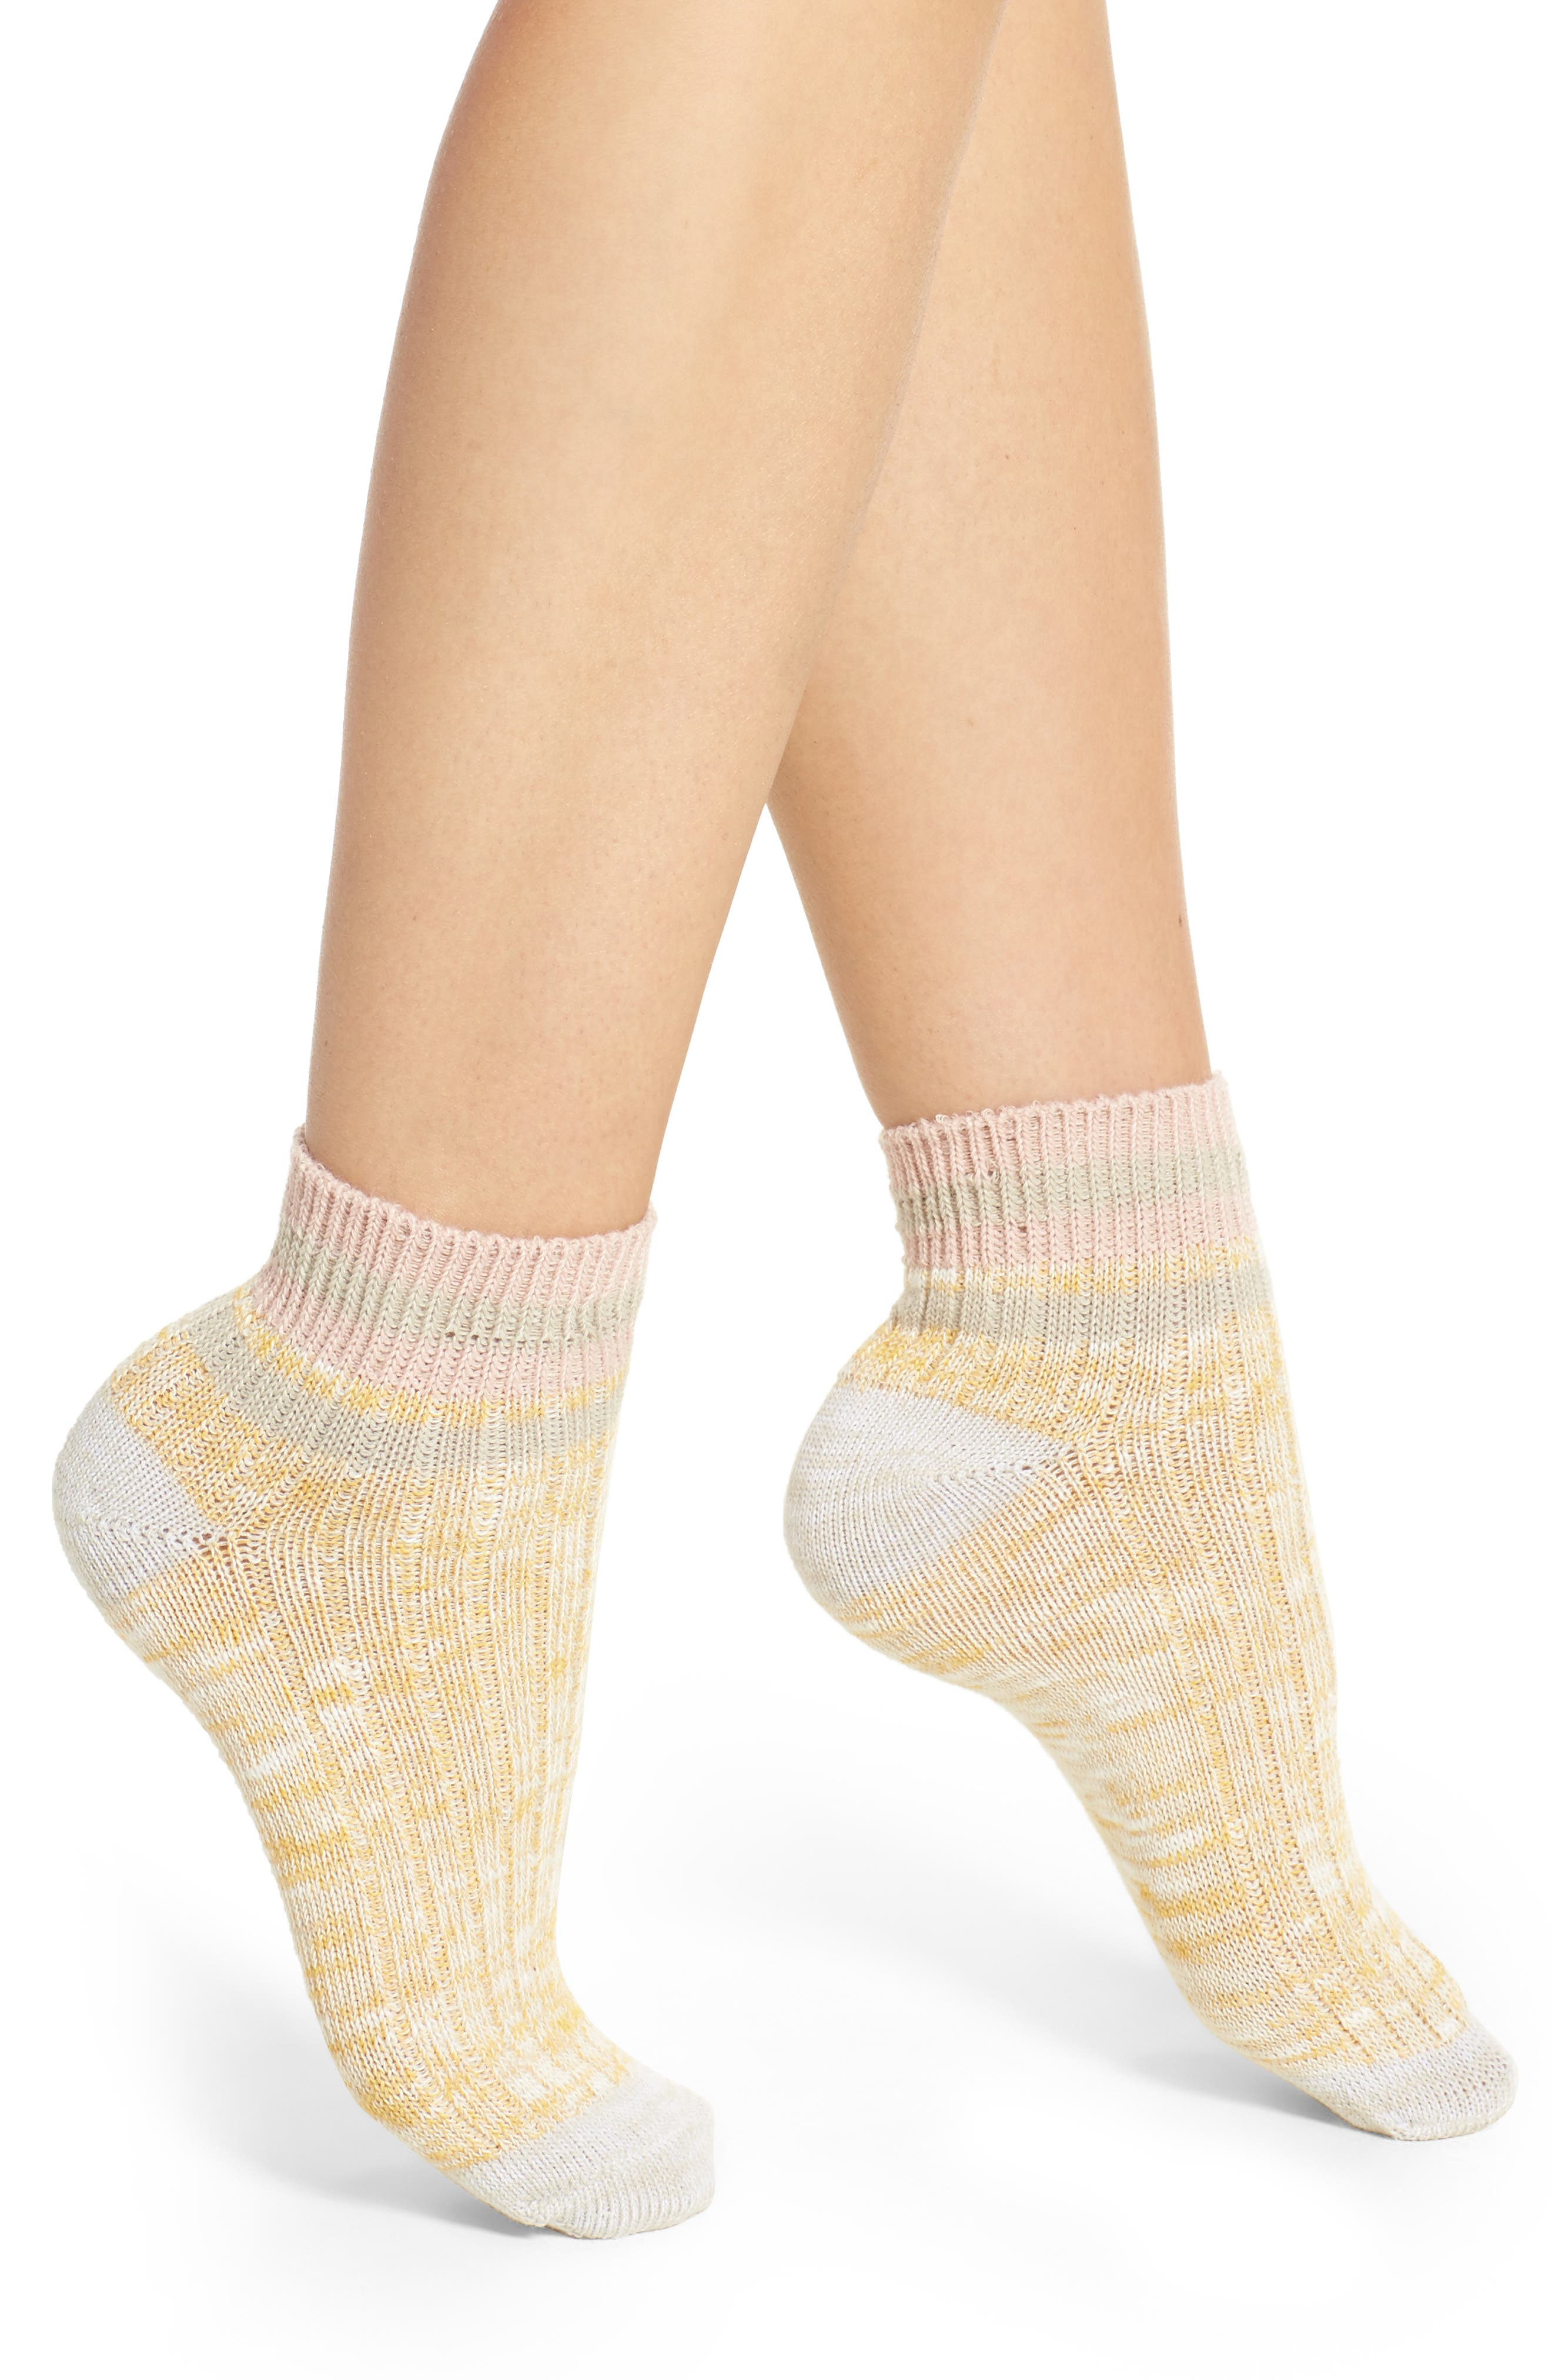 Bailey Ankle Socks,                             Main thumbnail 1, color,                             200